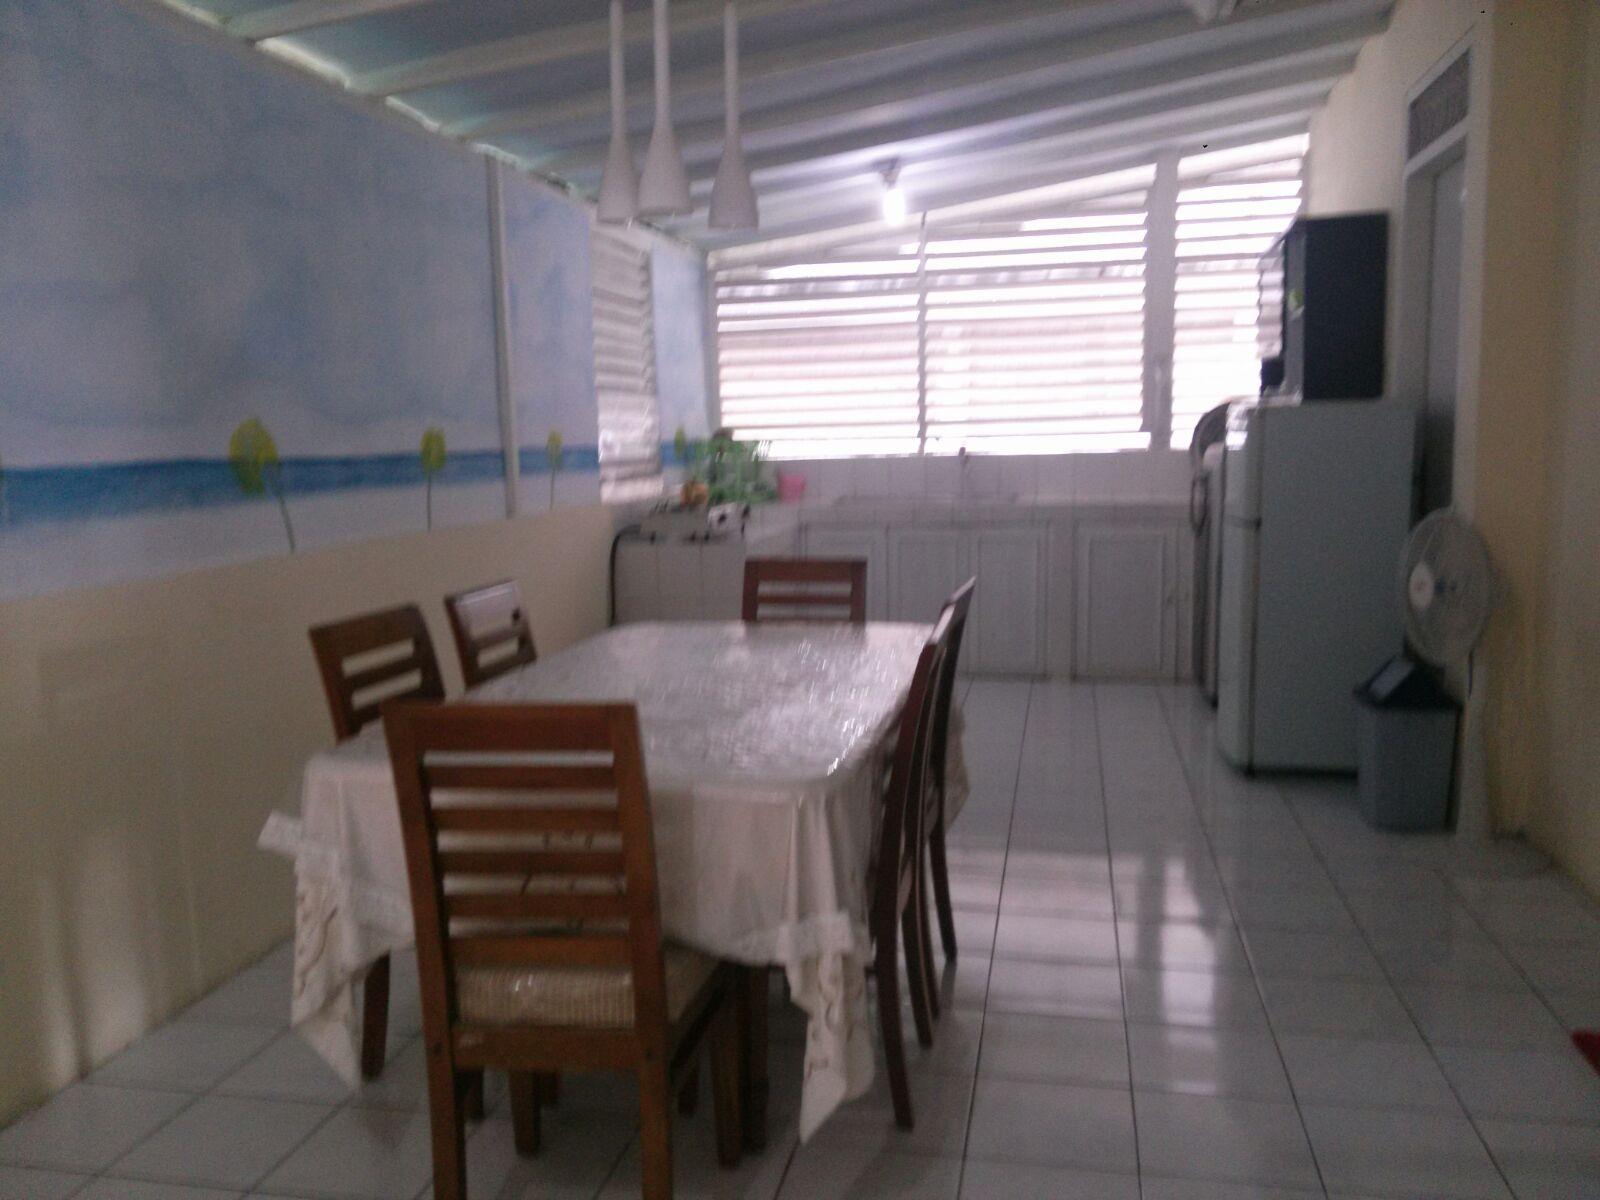 Sewa villa kota bunga type melati 3 kamar 1 lantai